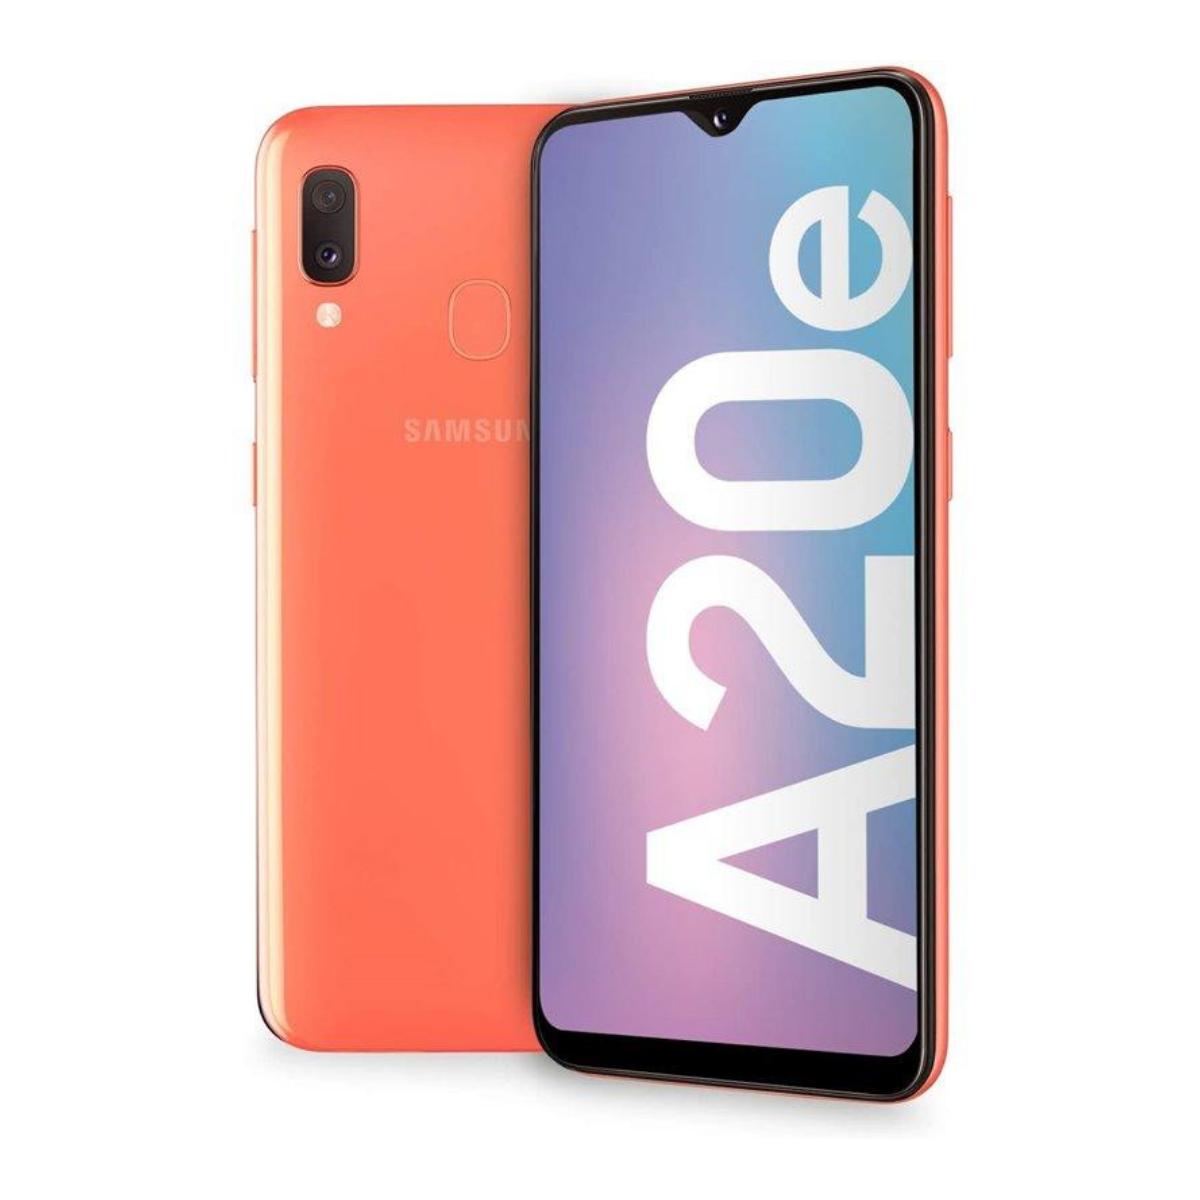 Sim Free Samsung Galaxy A20E 32GB Unlocked Mobile Phone - Coral